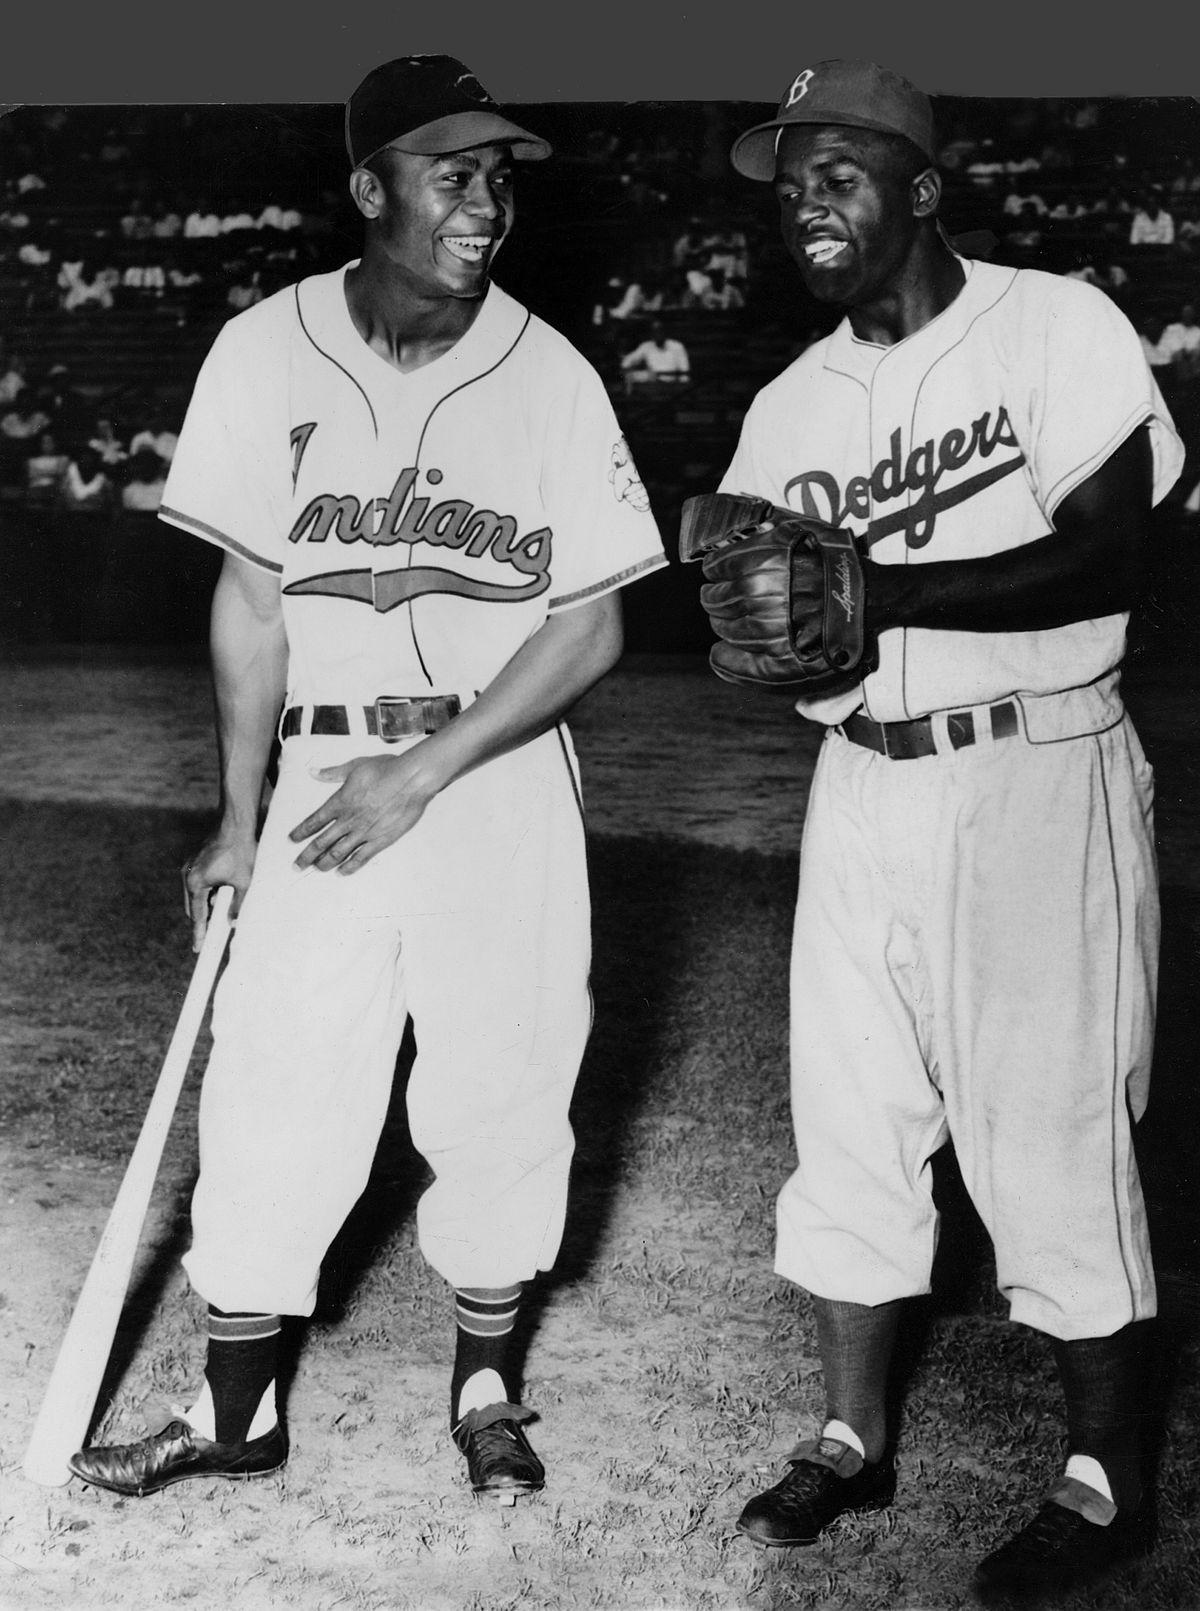 Black Baseball Greats, Larry Doby and Jackie Robinson